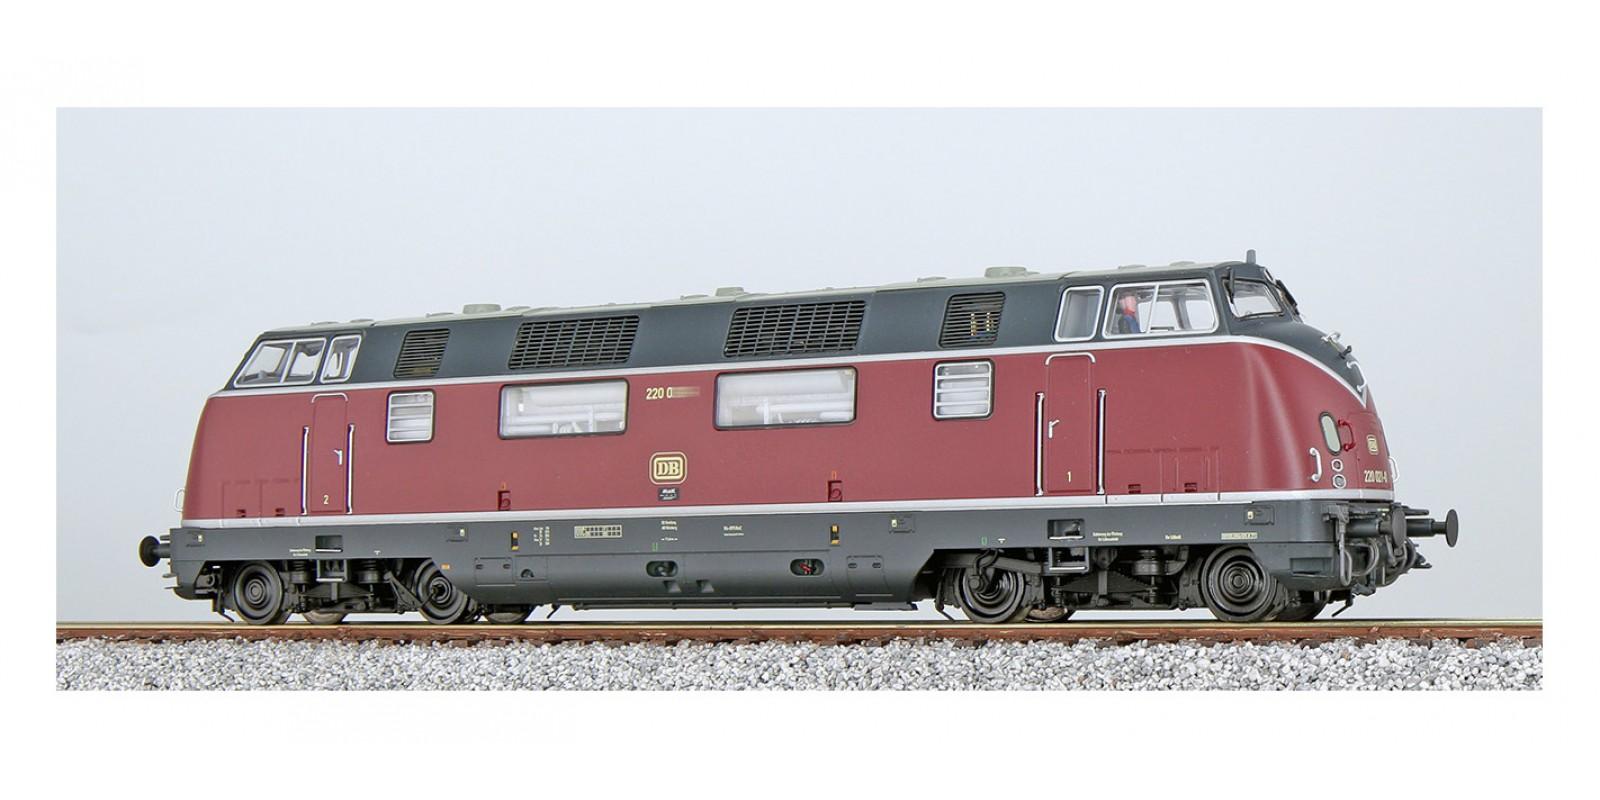 ES31337 Diesel loco, V200 019 of the DB, oldred, Era IV, Sound+Smoke, DC/AC